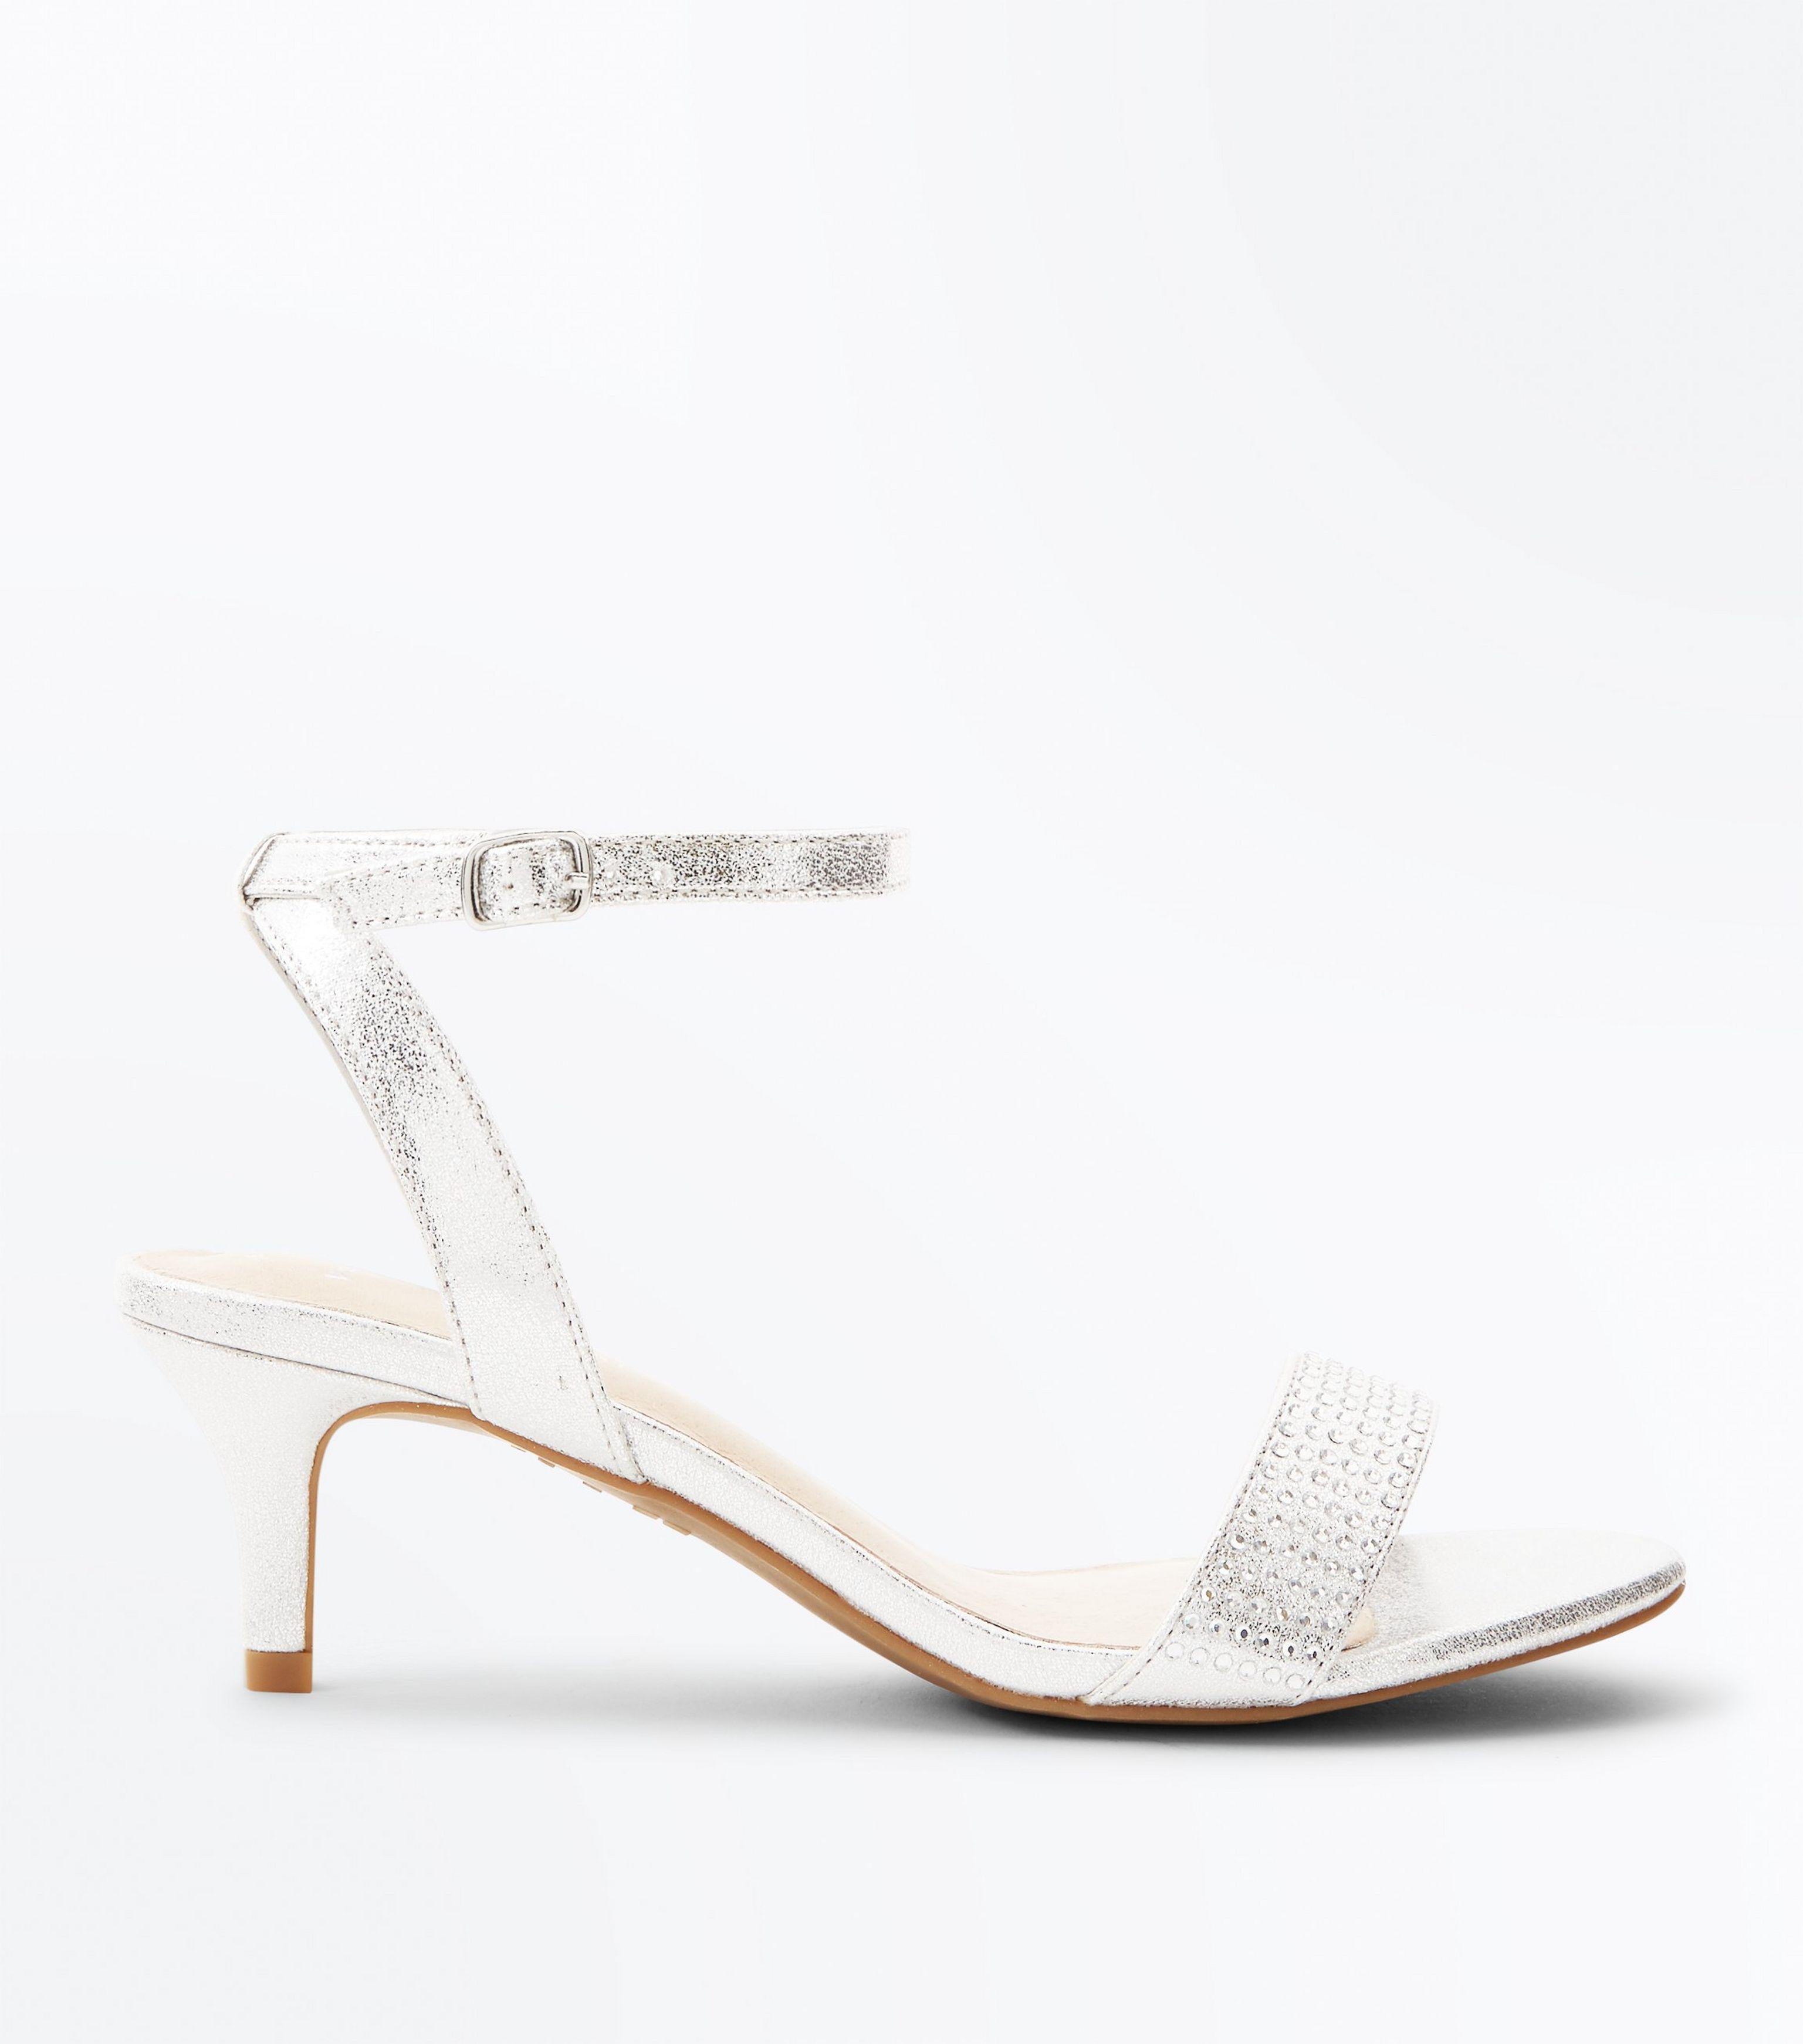 96d501c5103b New Look Wide Fit Silver Comfort Flex Diamanté Strap Kitten Heels in ...